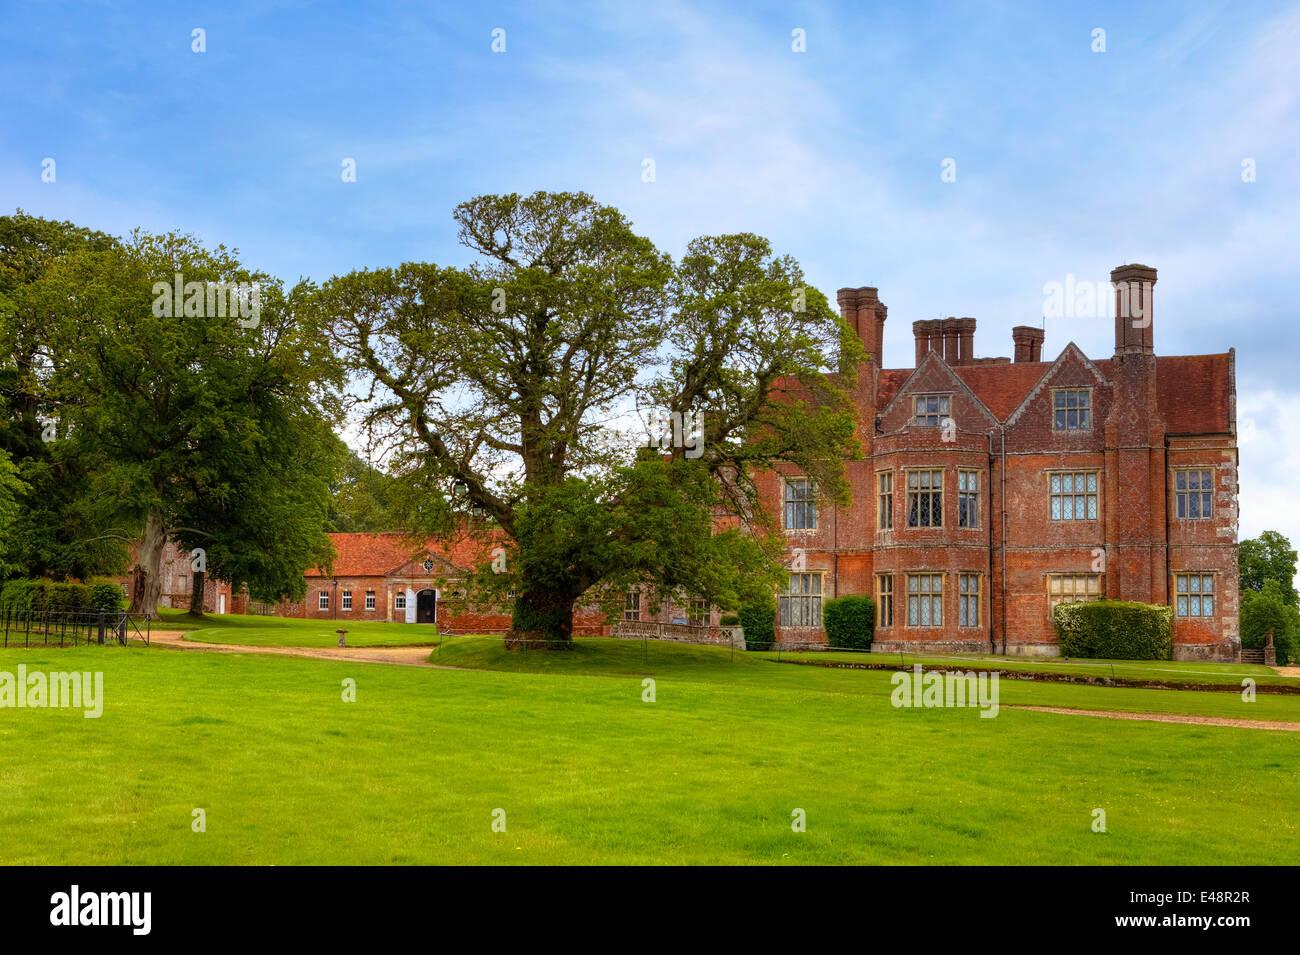 Breamore House, Breamore, Hampshire, England, United Kingdom Stock Photo